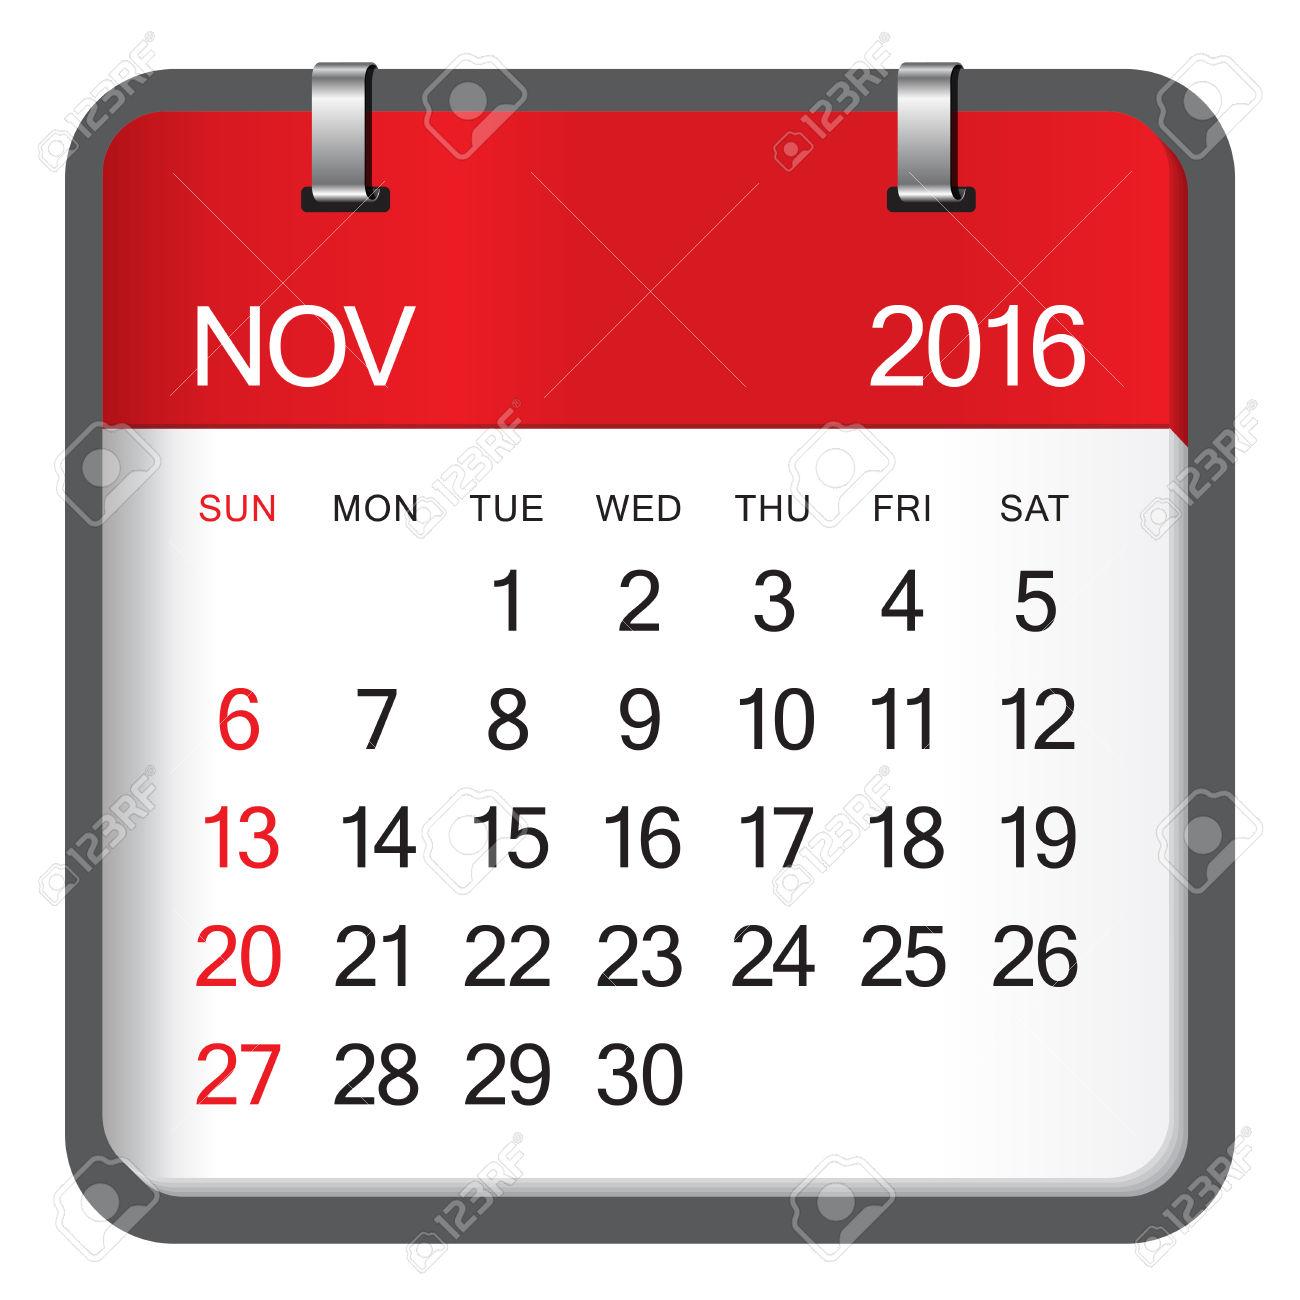 Clipart calendar november 2016